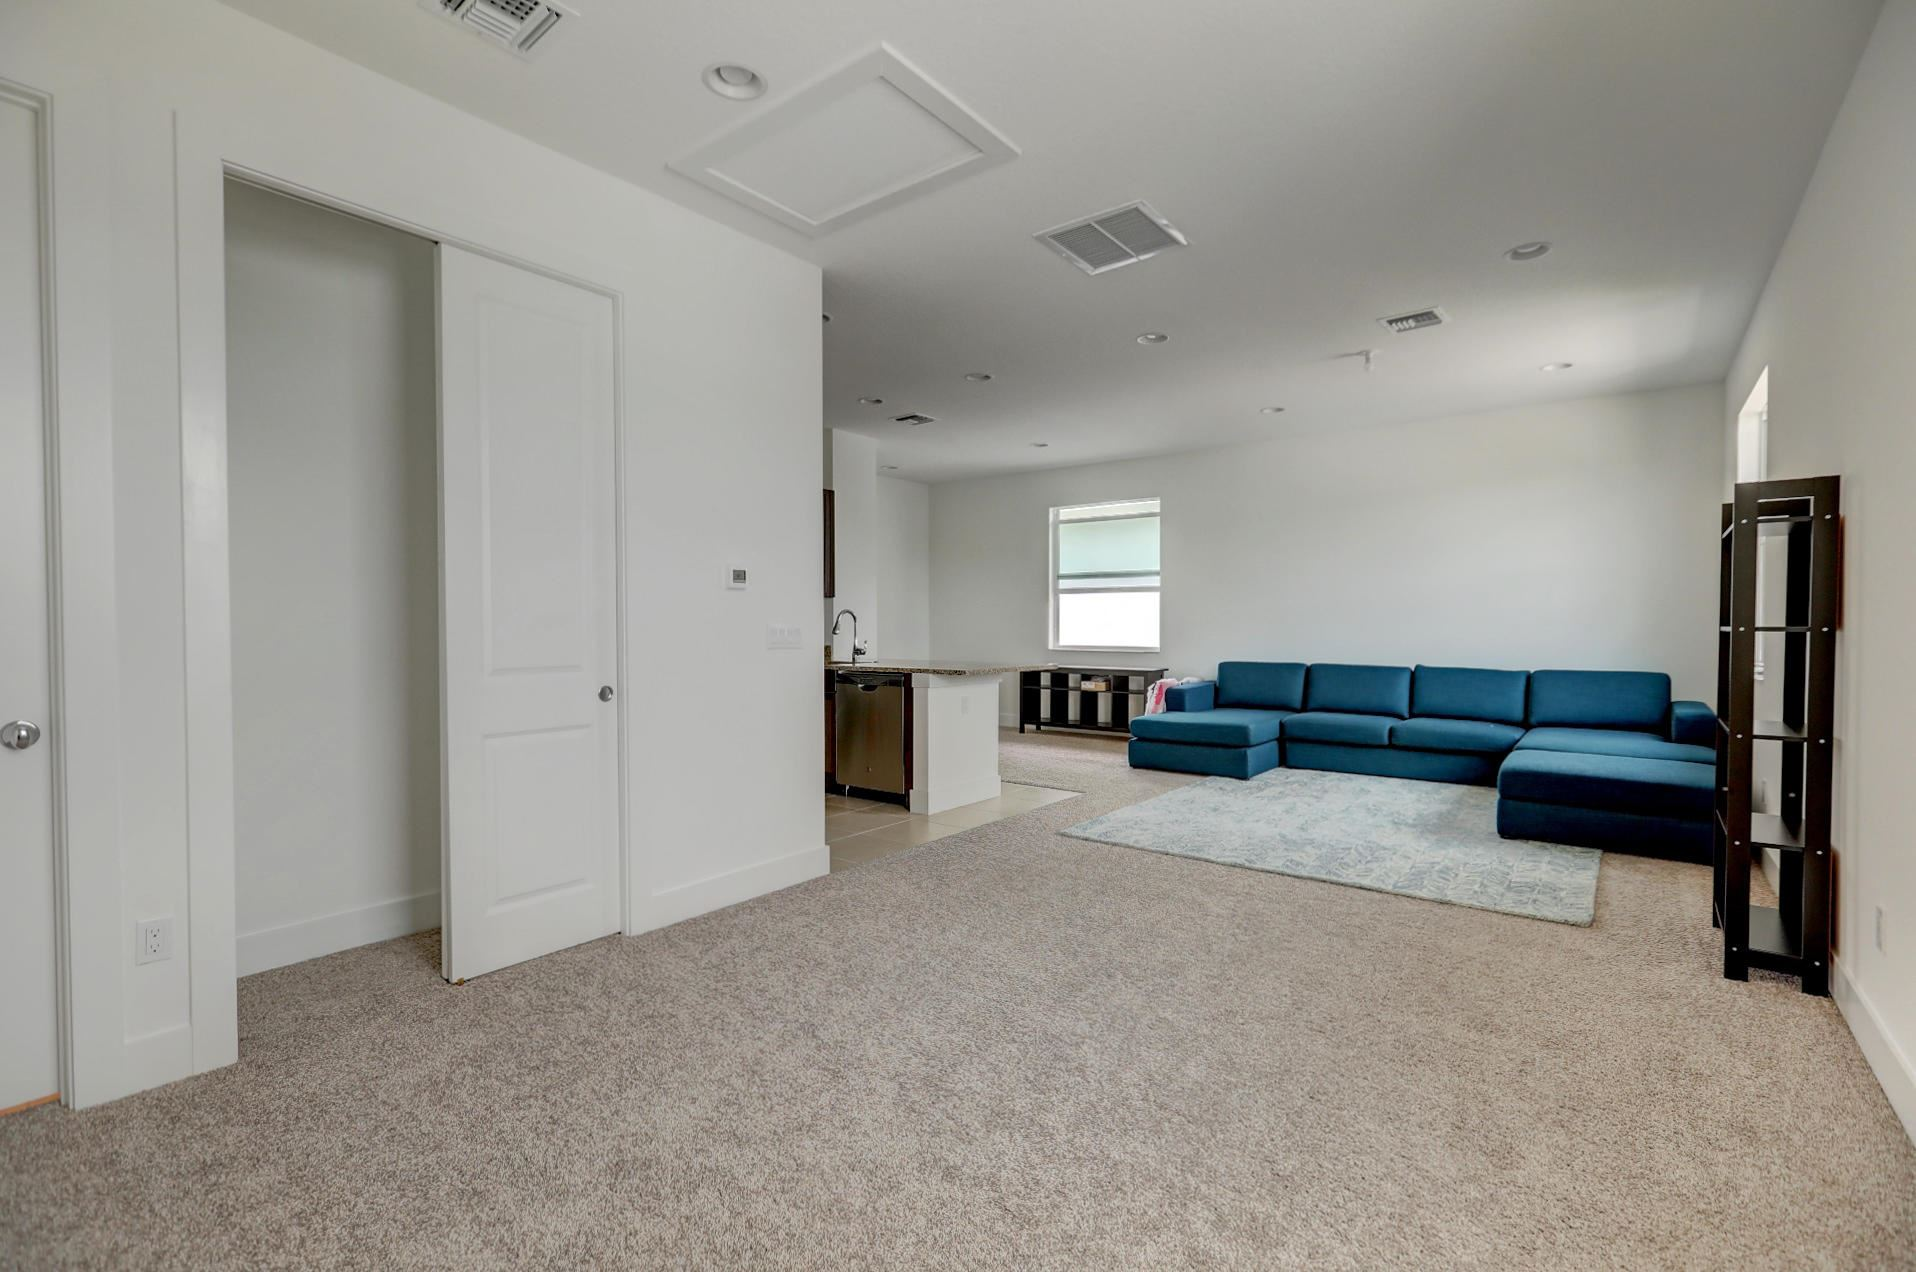 Photo of 13233 Alton Road, Palm Beach Gardens, FL 33418 (MLS # RX-10646962)